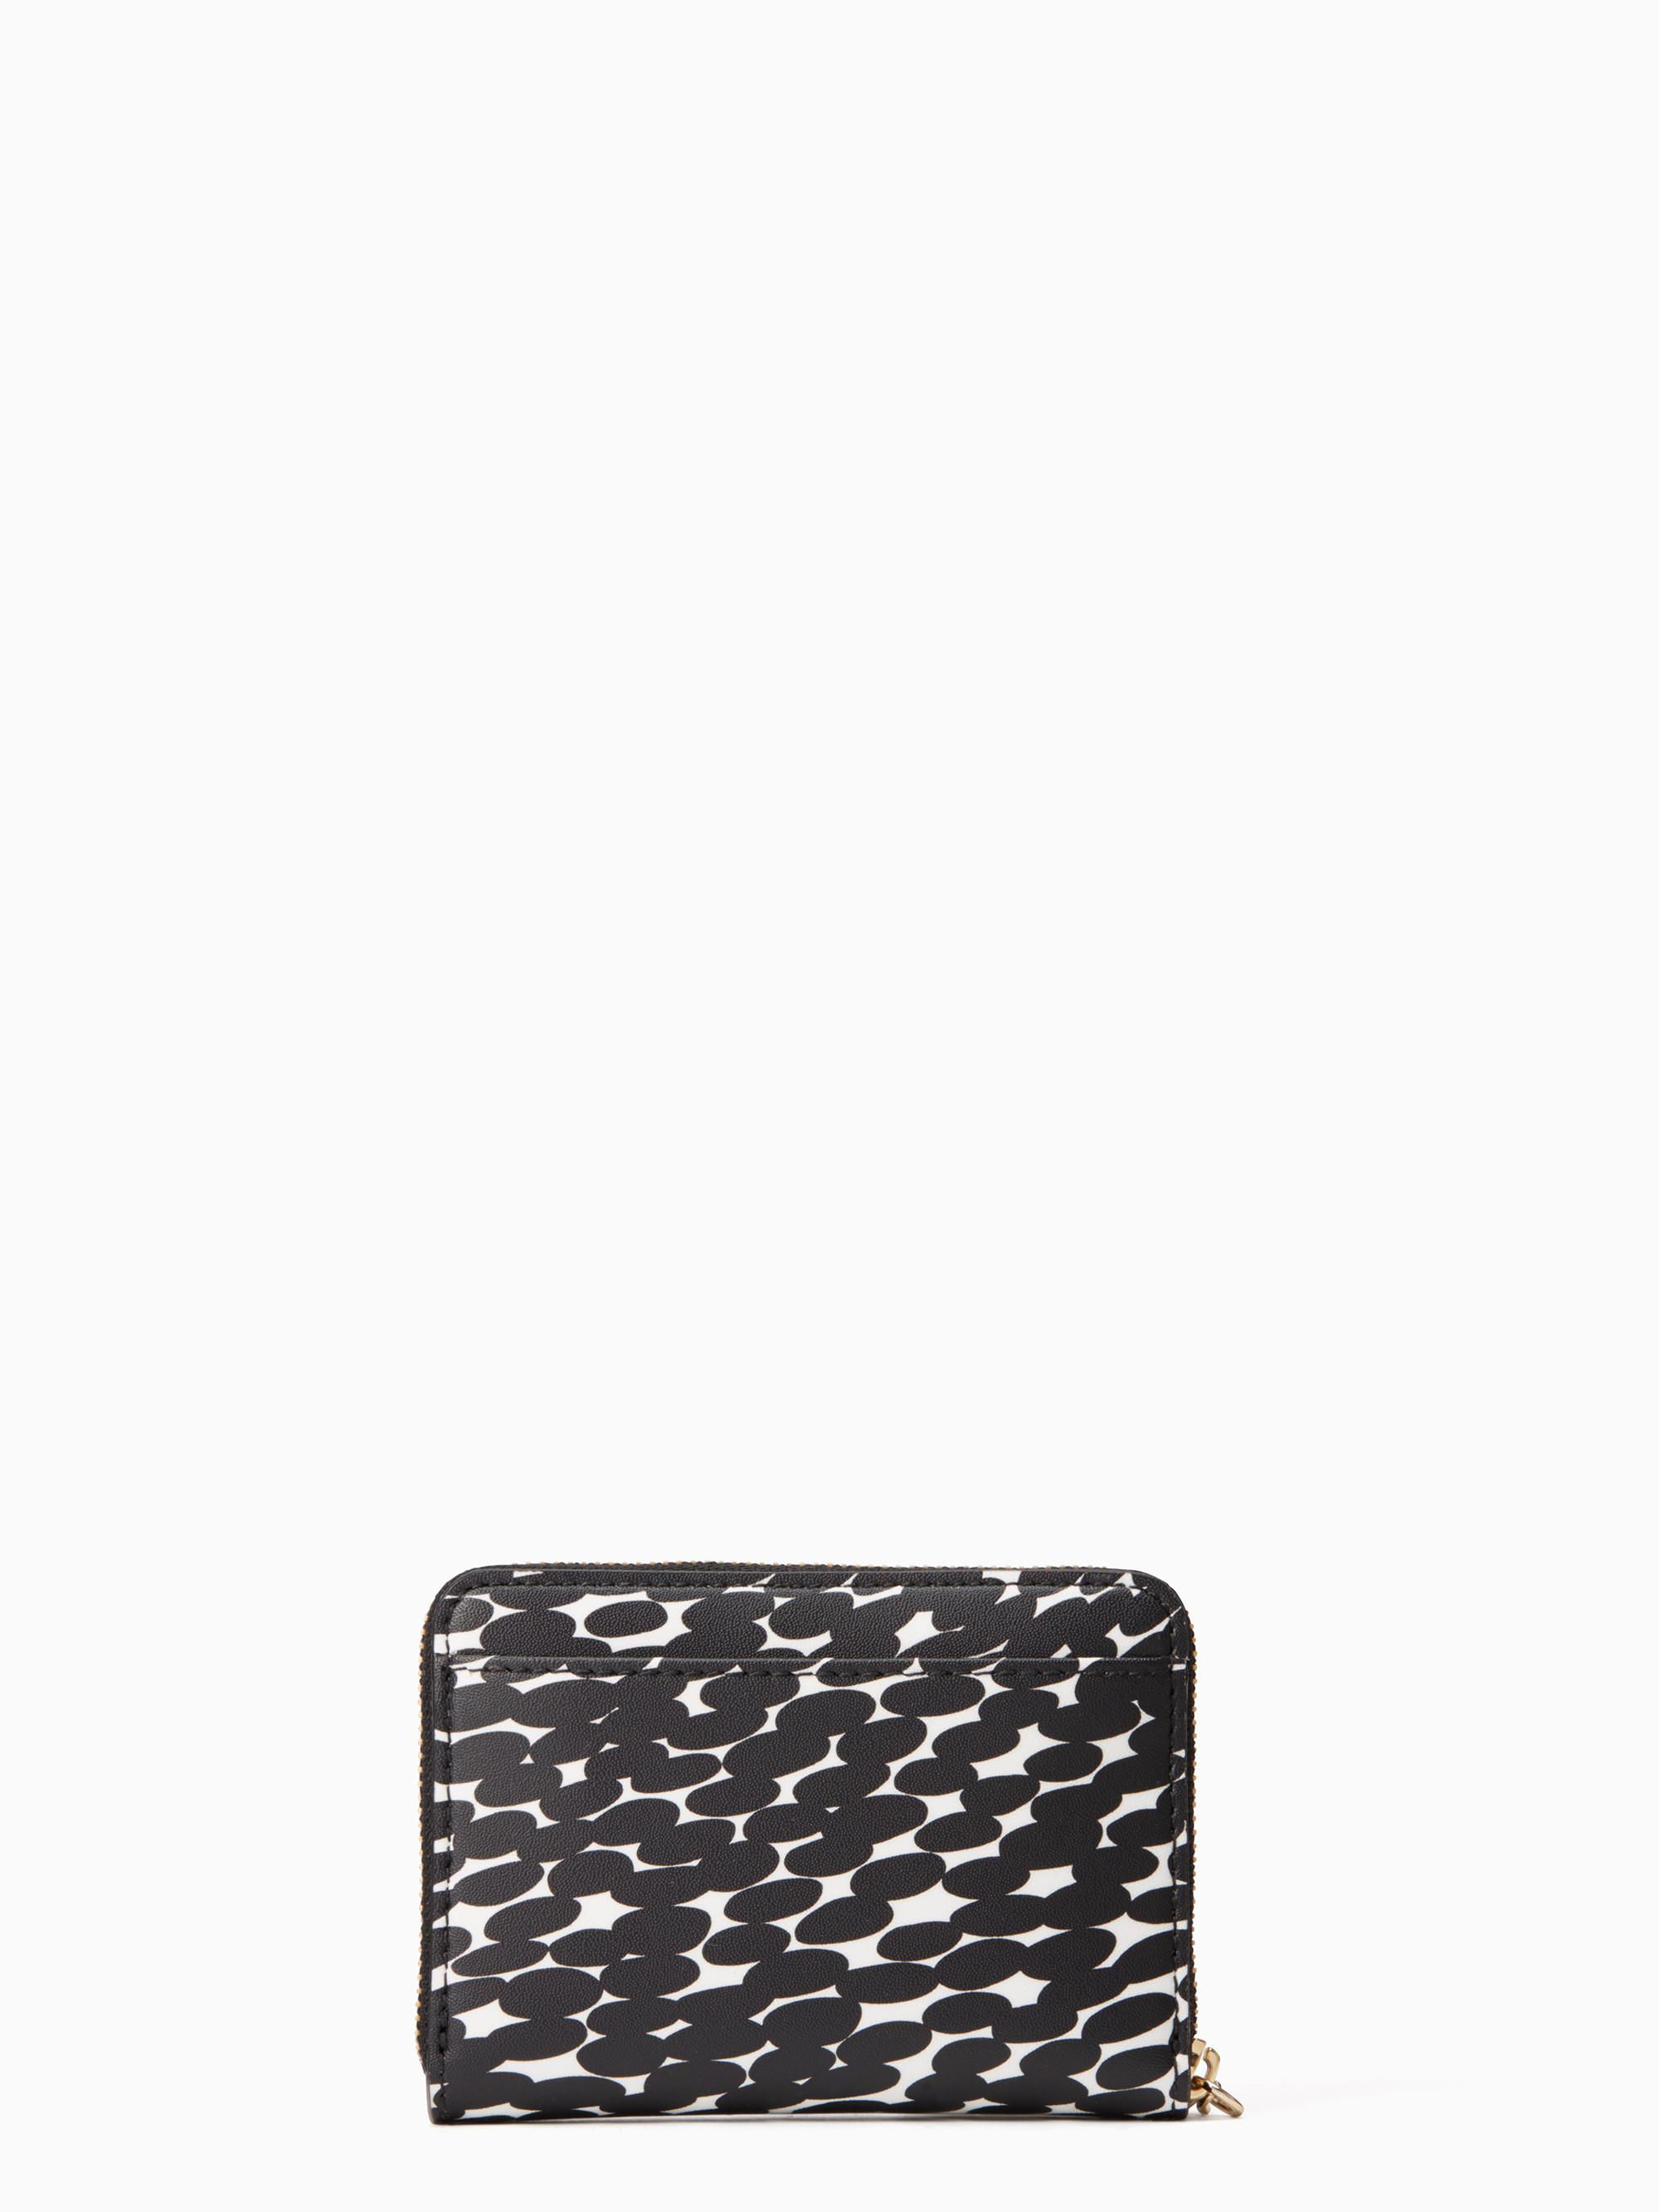 Kate Spade Leather Grove Street Petals Texture Dani in Black - Lyst